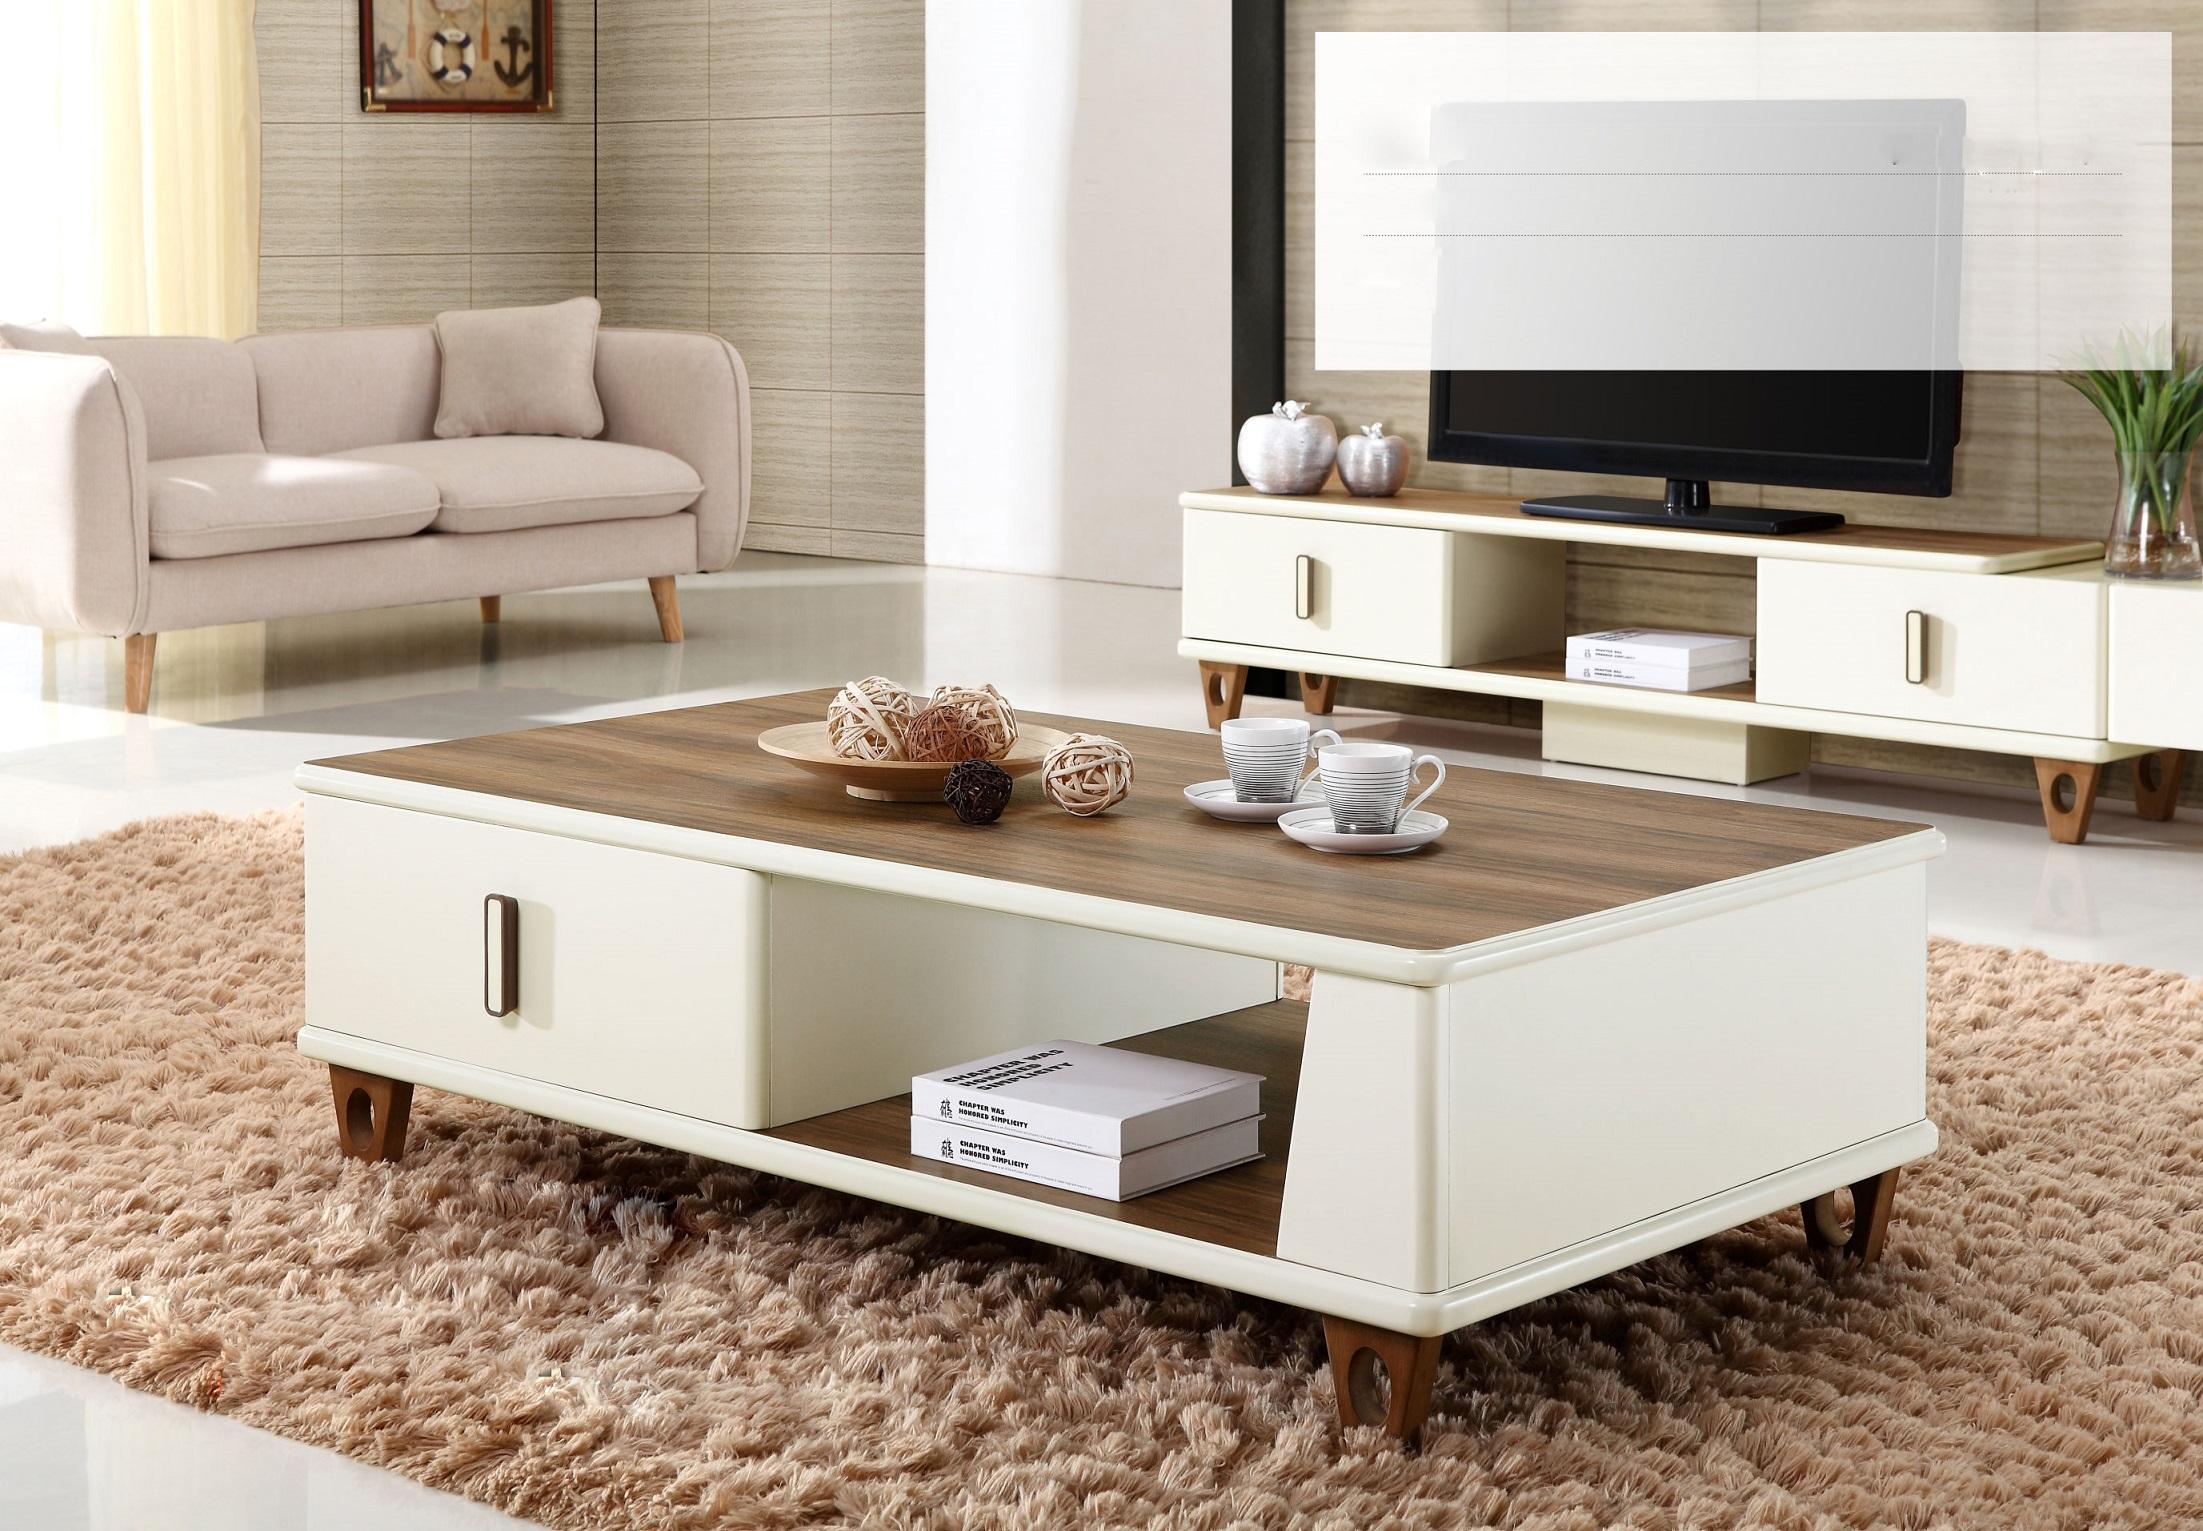 sofa accessories names best brands in hyderabad furniture shop phnom penh cambodia design other